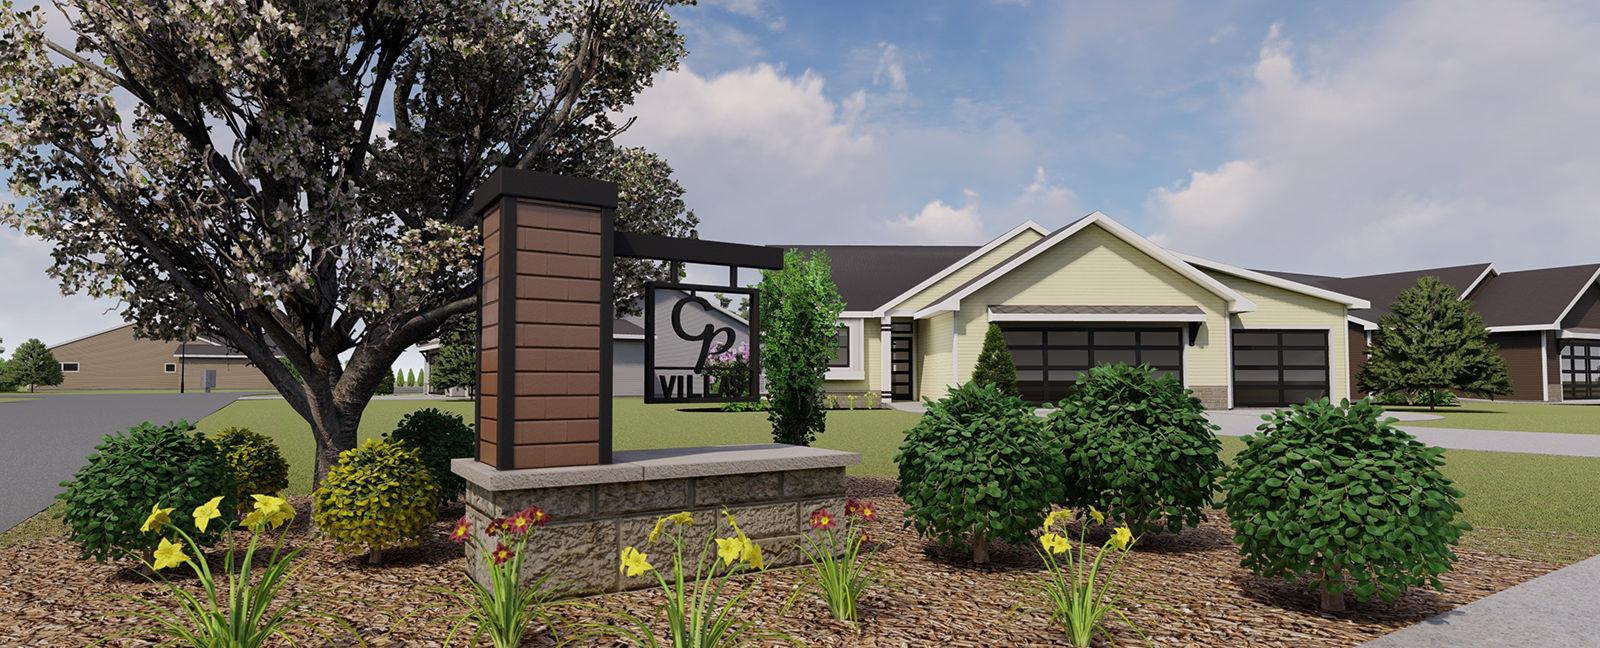 City Park Villas in Hudsonville Michigan - fine community living in beautiful development